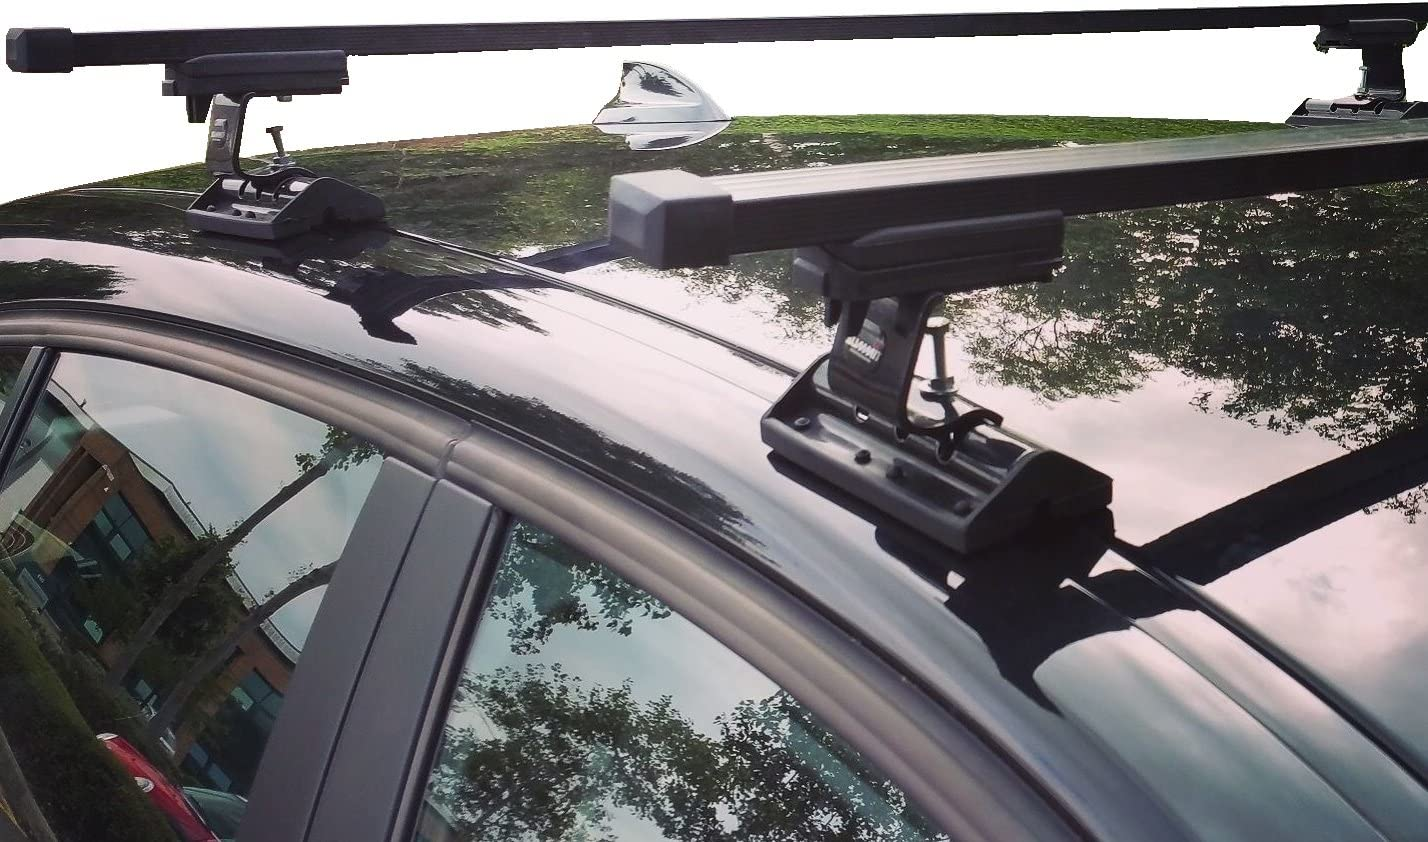 BM Xtremeauto MAZDA 3 5 Doors 2014-2016 Sturdy Durable Steel Car Roof Bar Rack